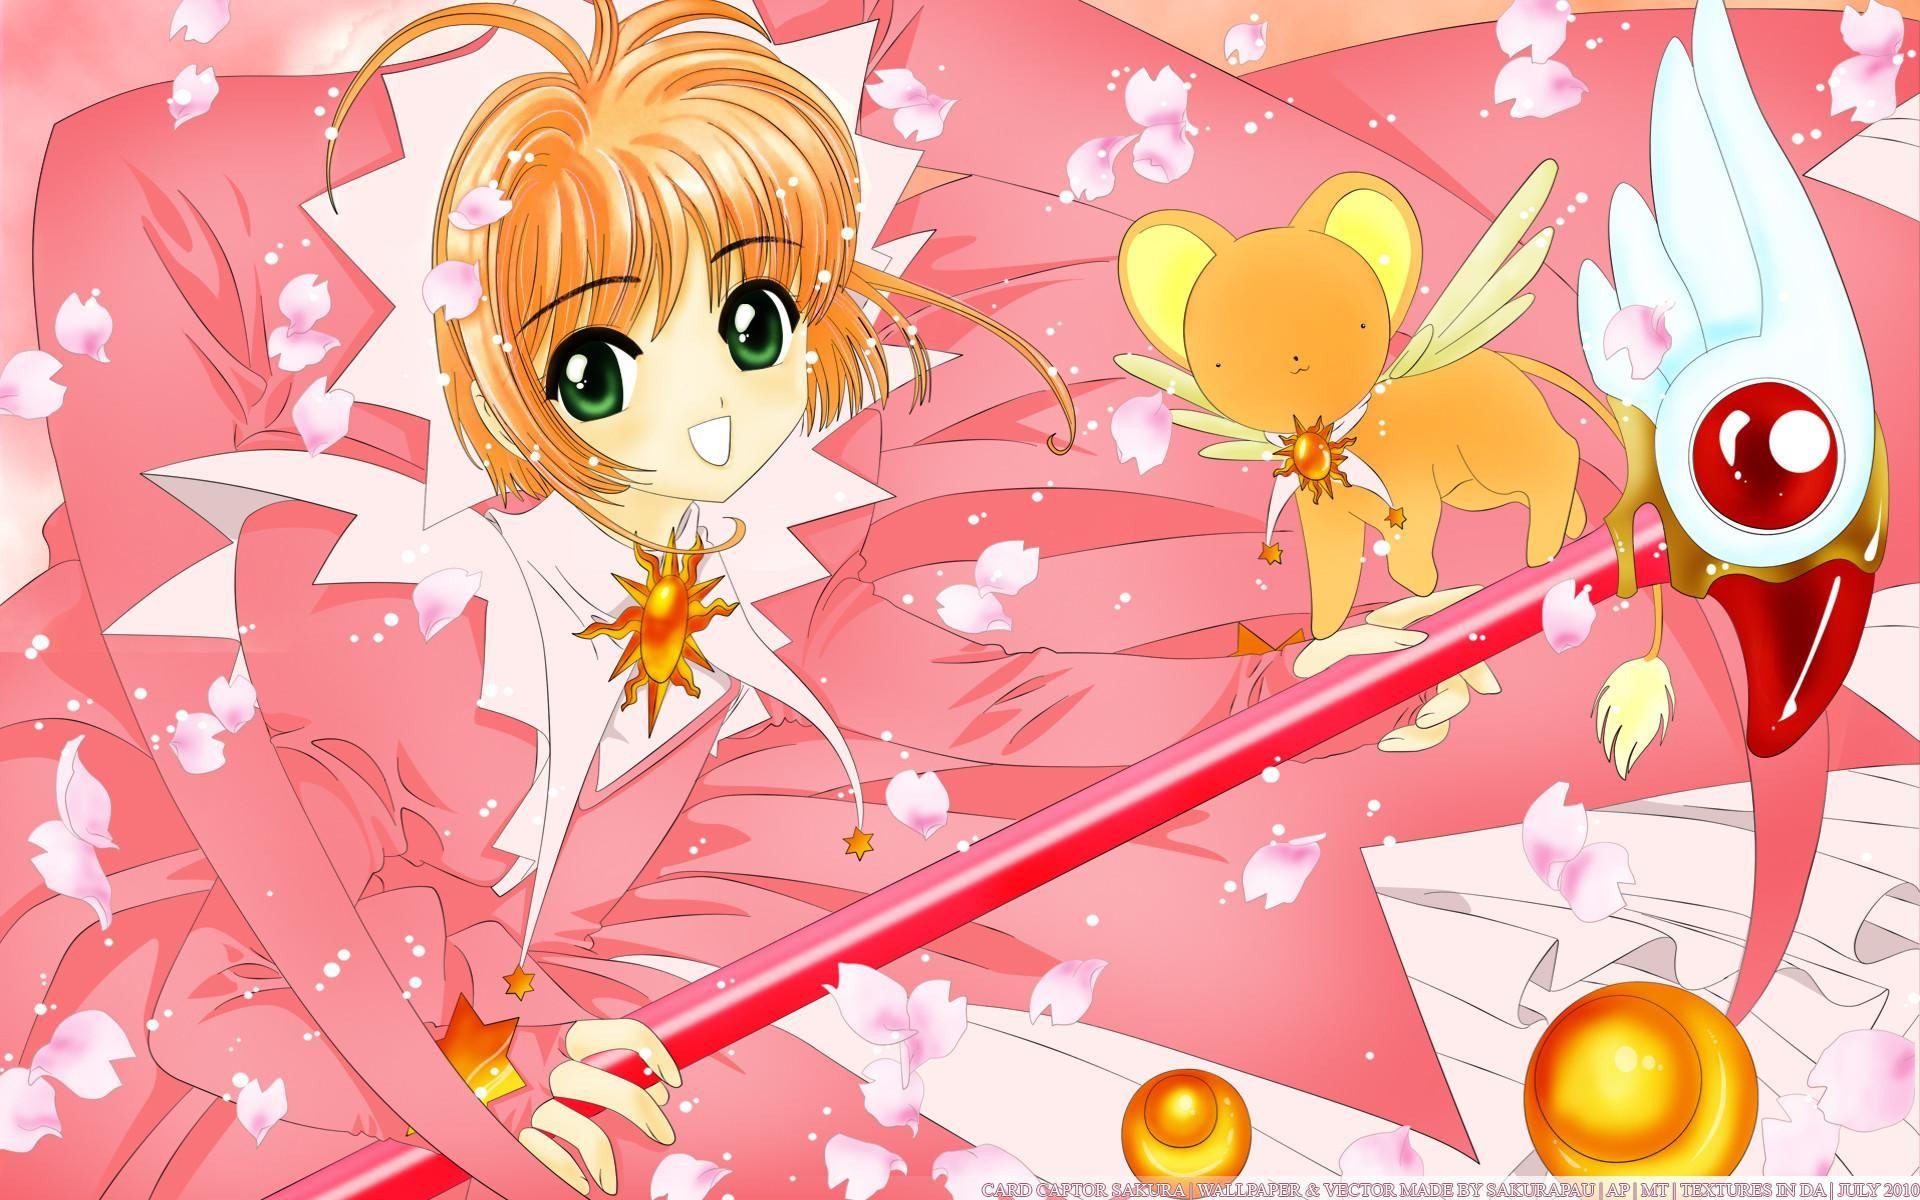 Sakura Cardcaptor Sakura Wallpaper 4560074 Fanpop Hd Wallpapers Sakura Card Cardcaptor Sakura Anime